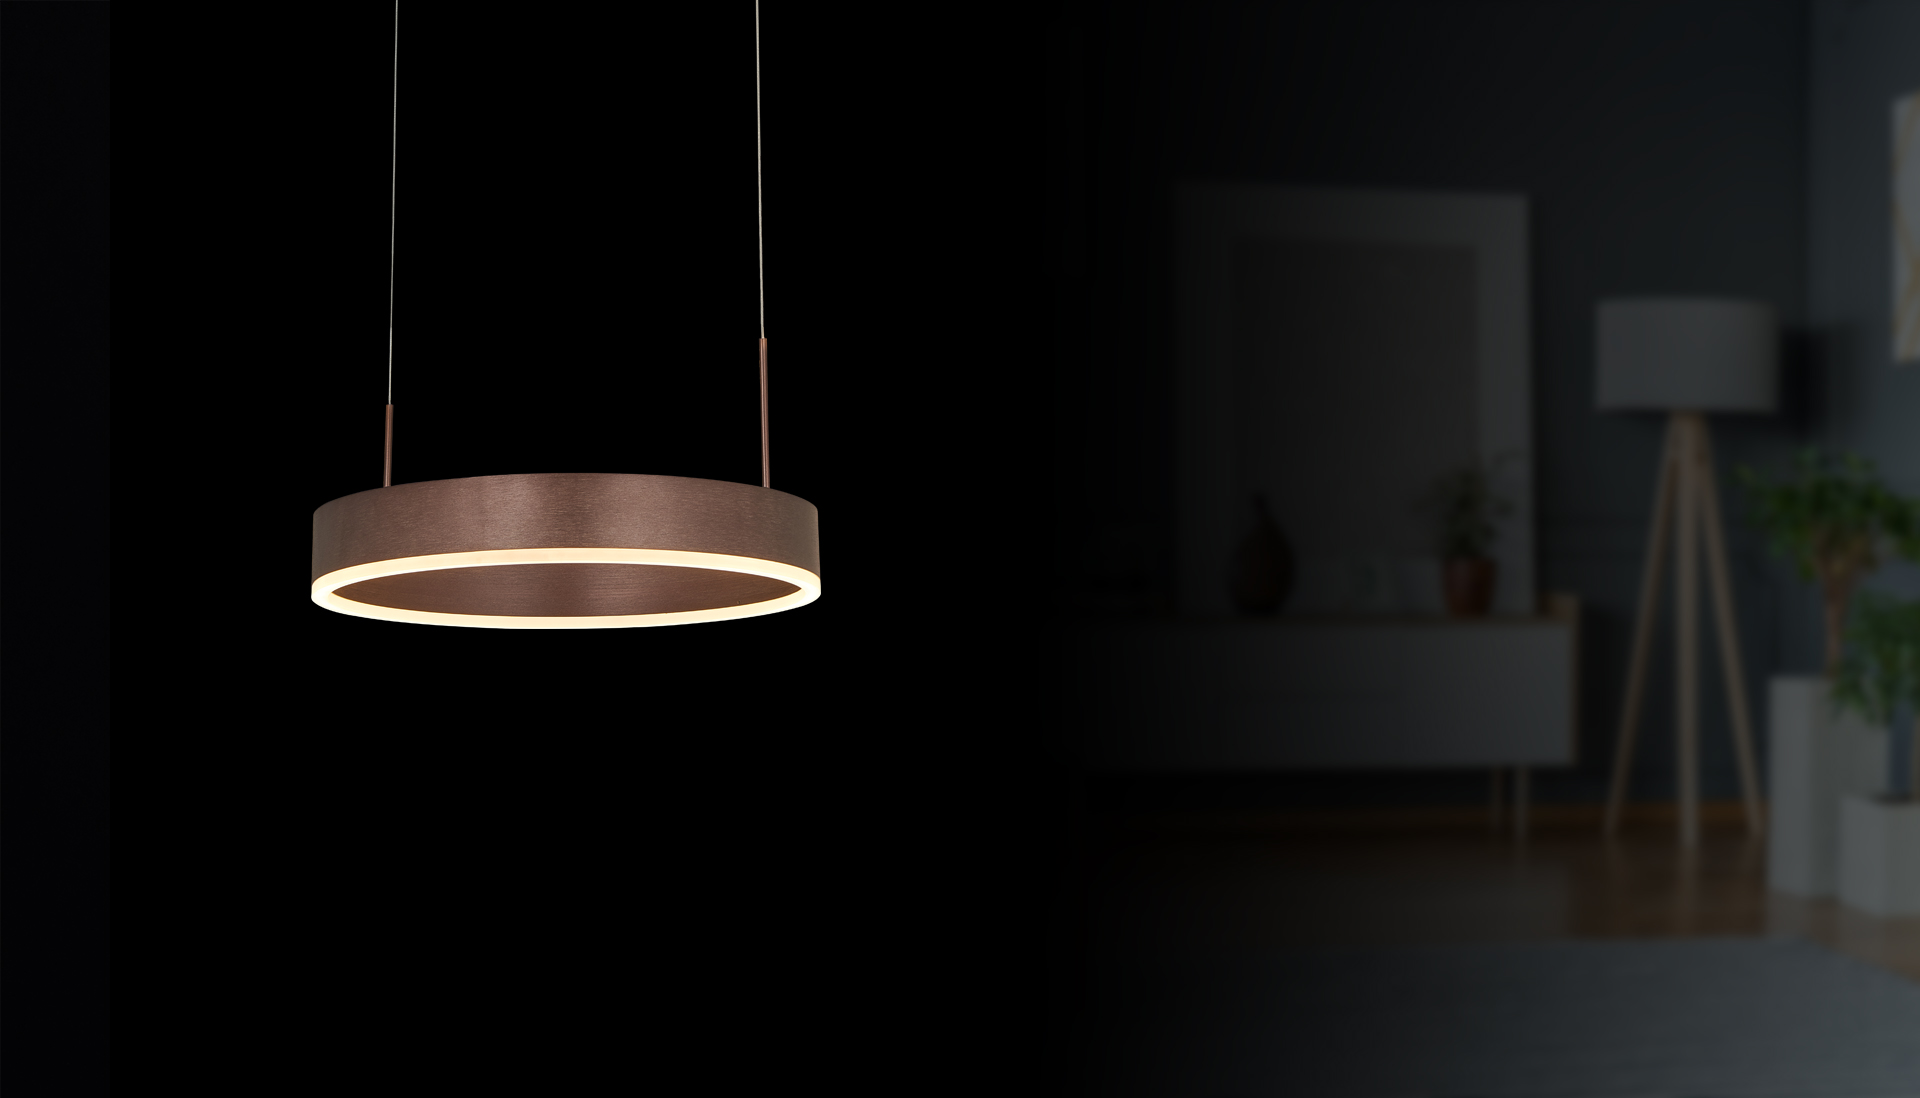 LED Hängelampe & Ringleuchte Milano